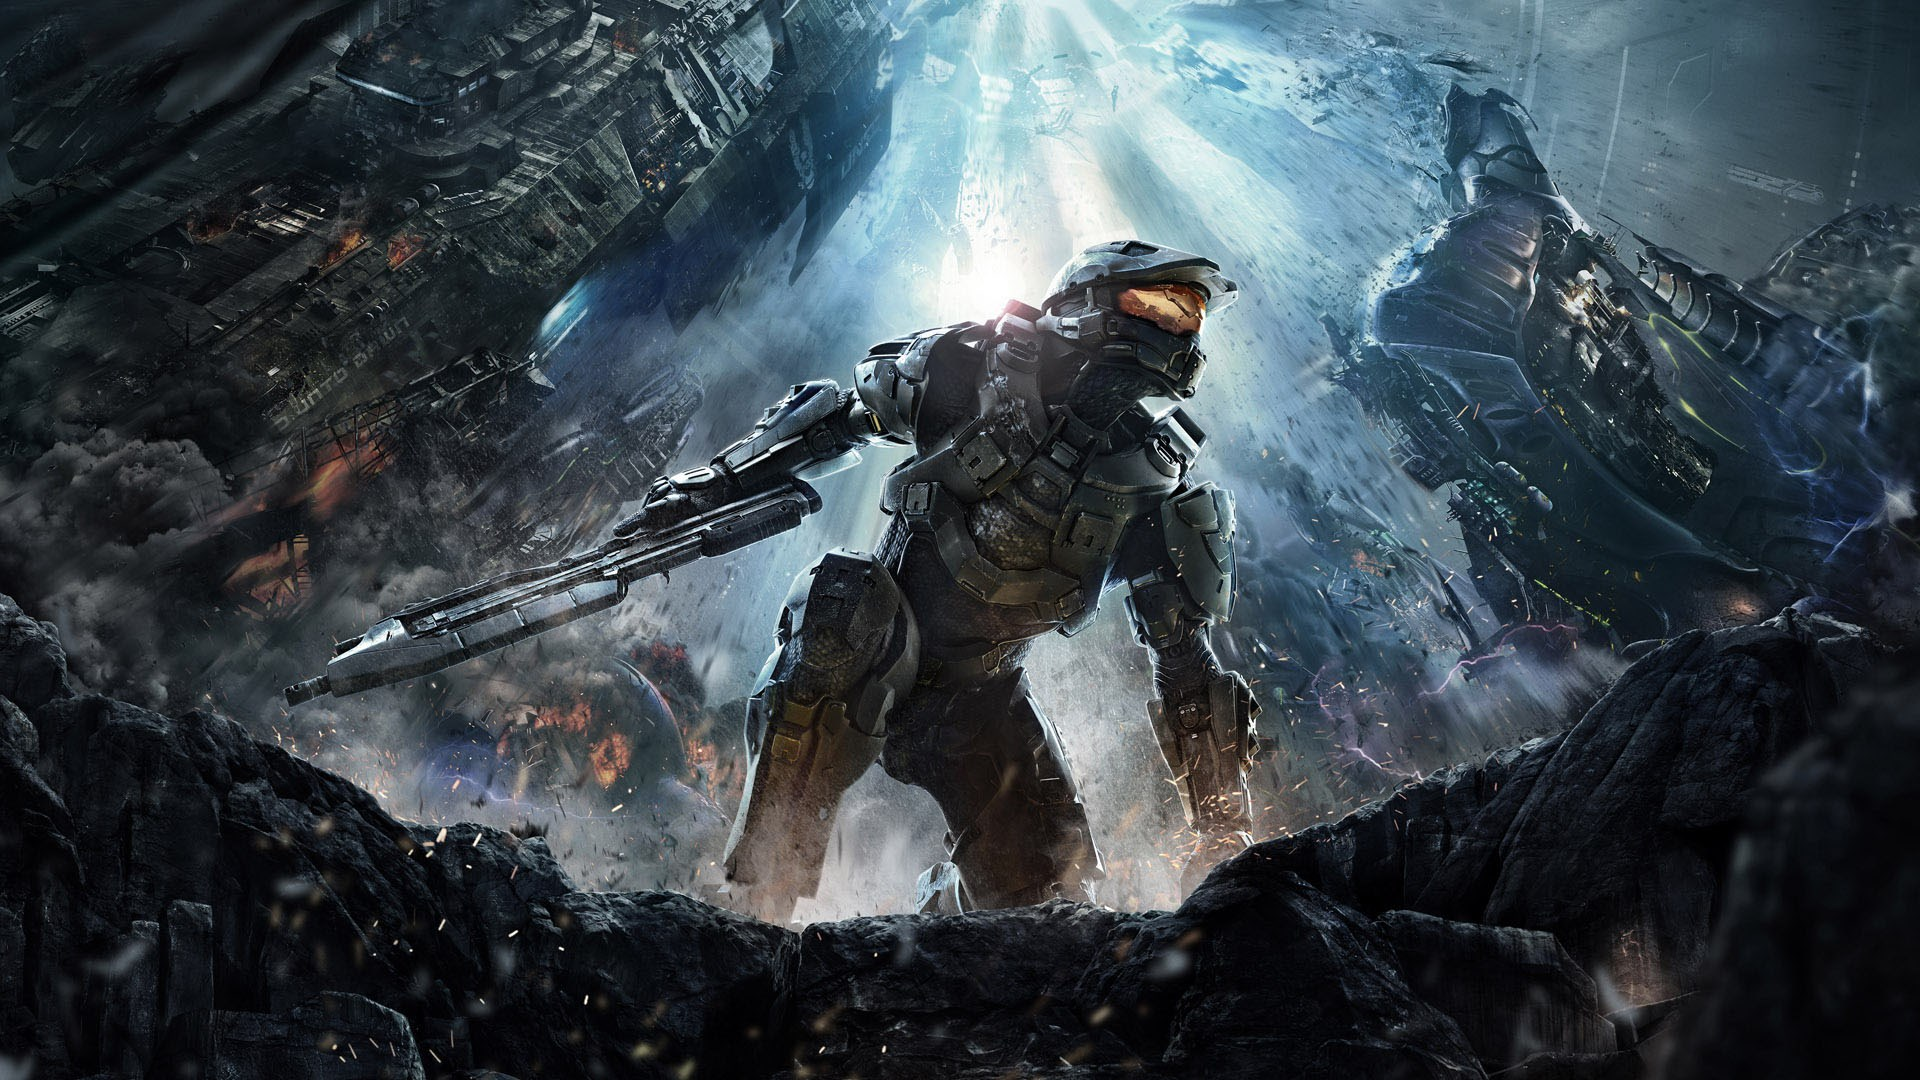 matchmaking förbud Halo 5